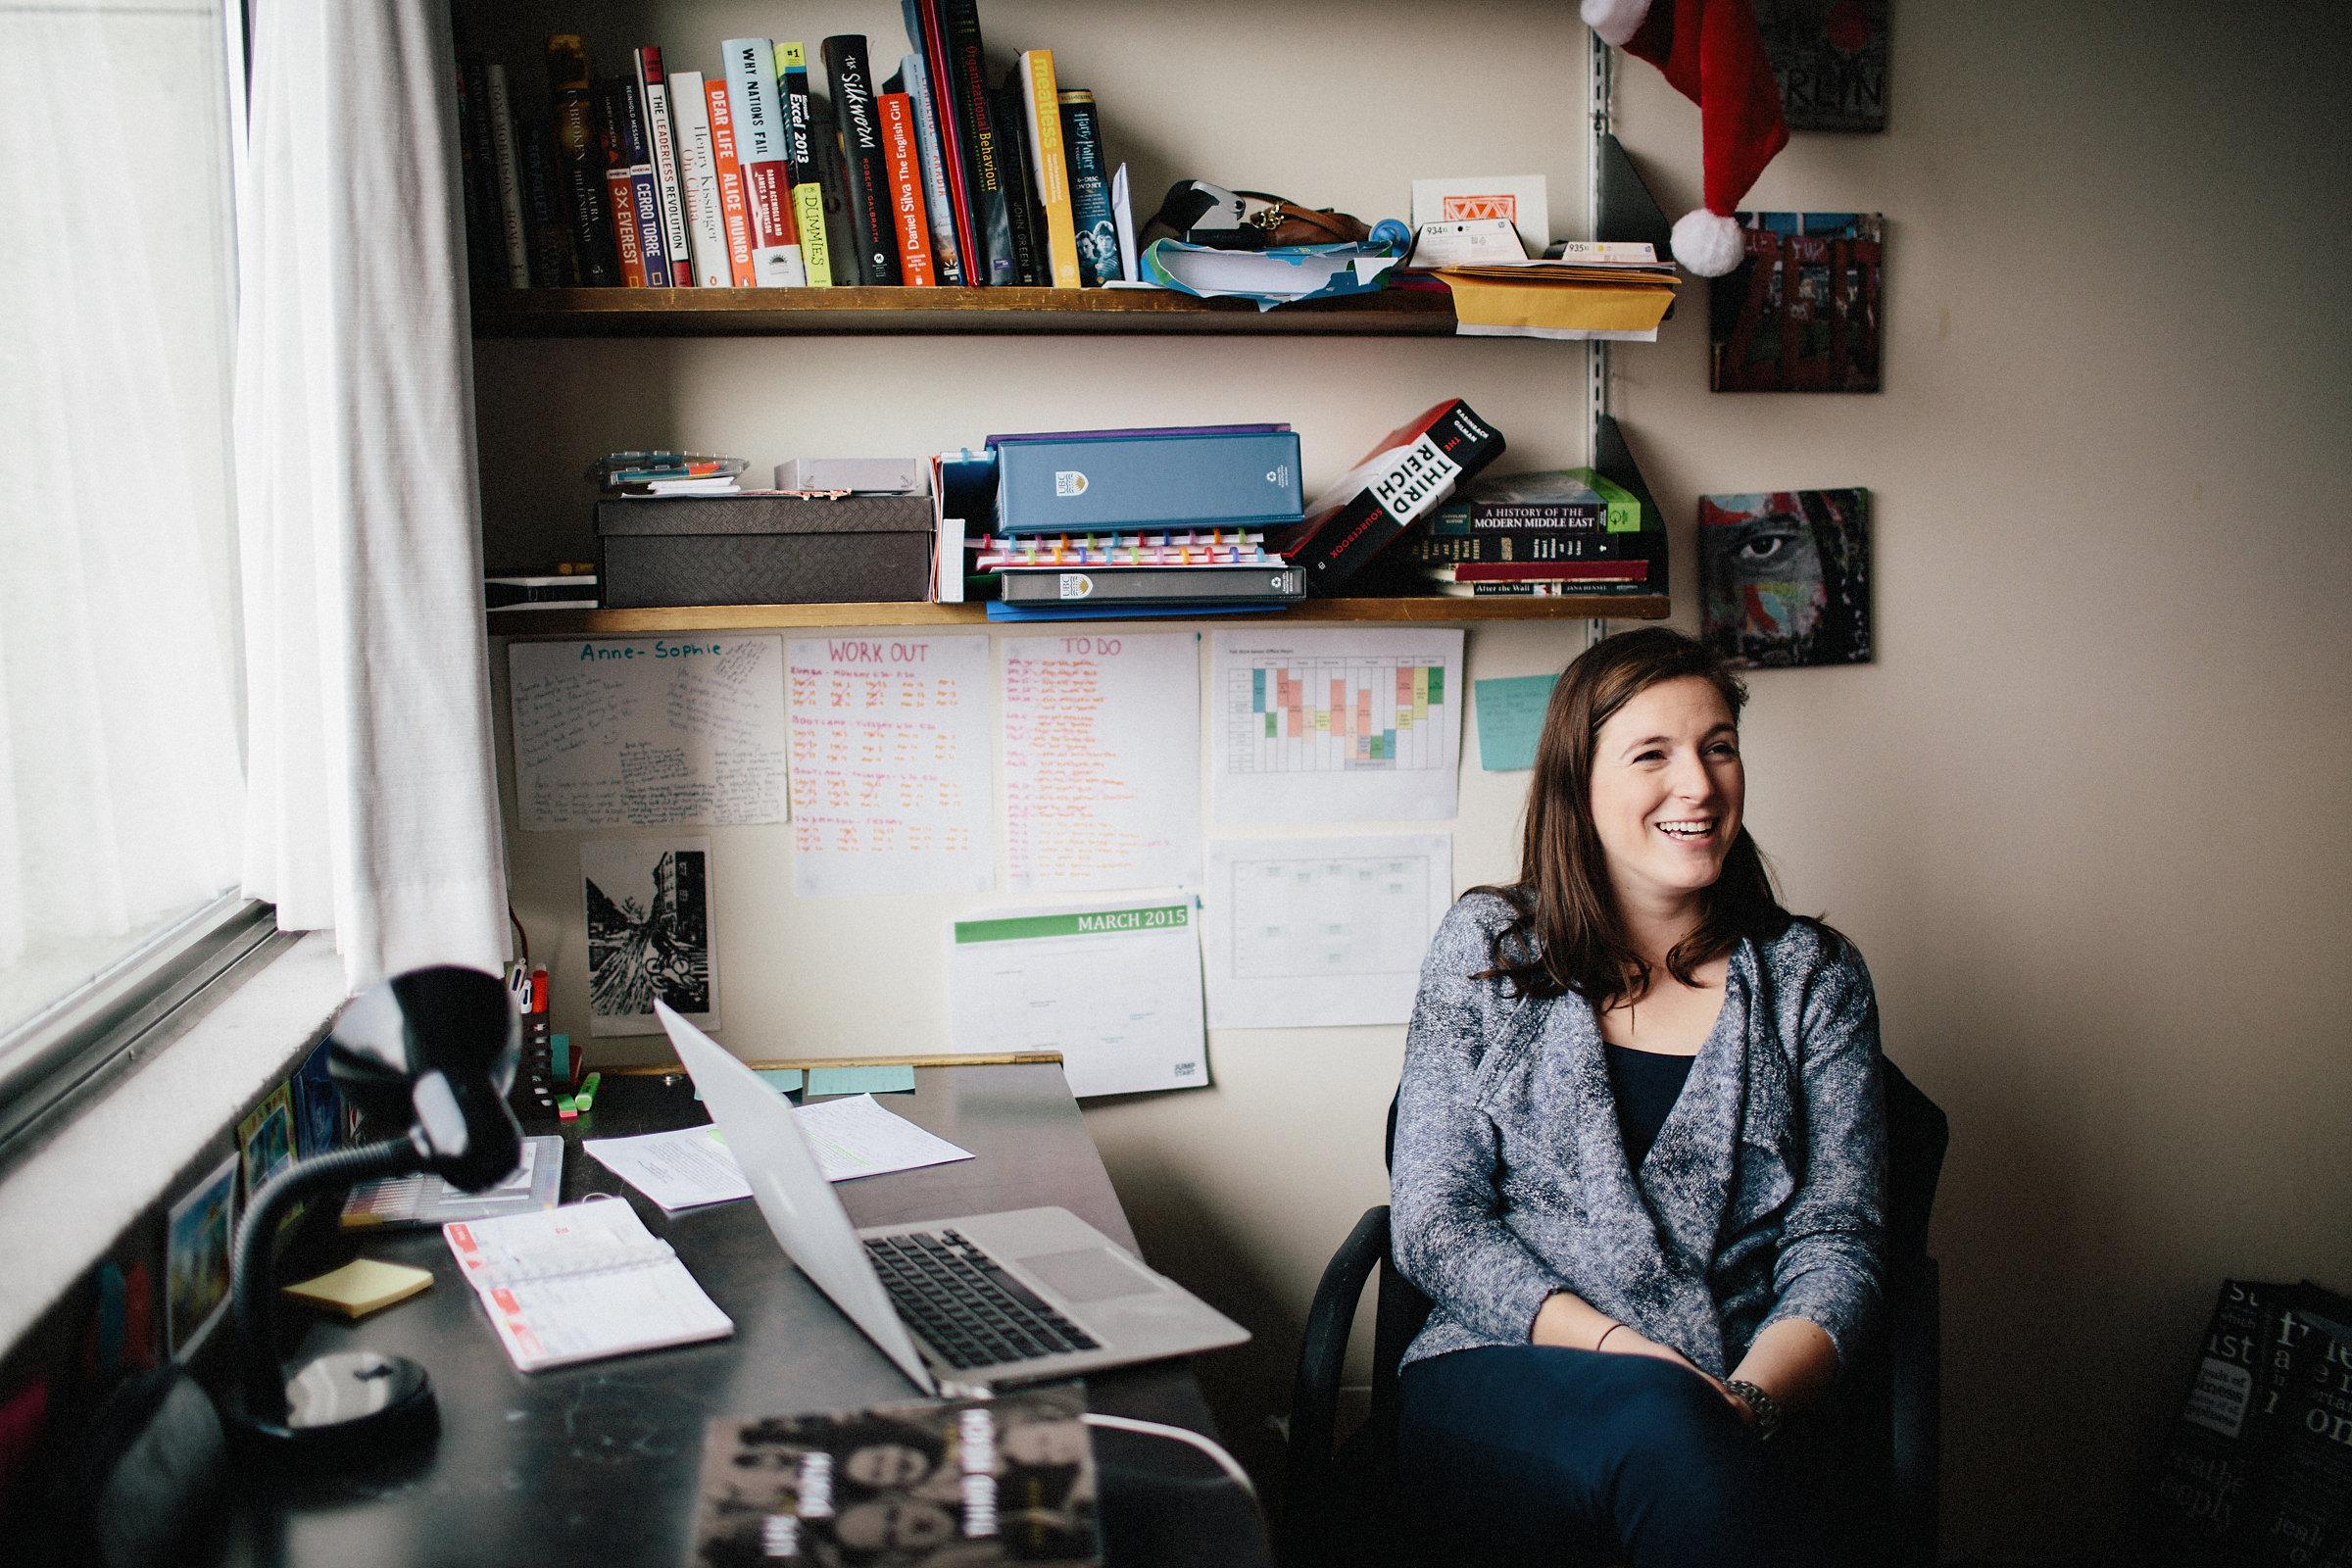 student in dorm sitting at desk